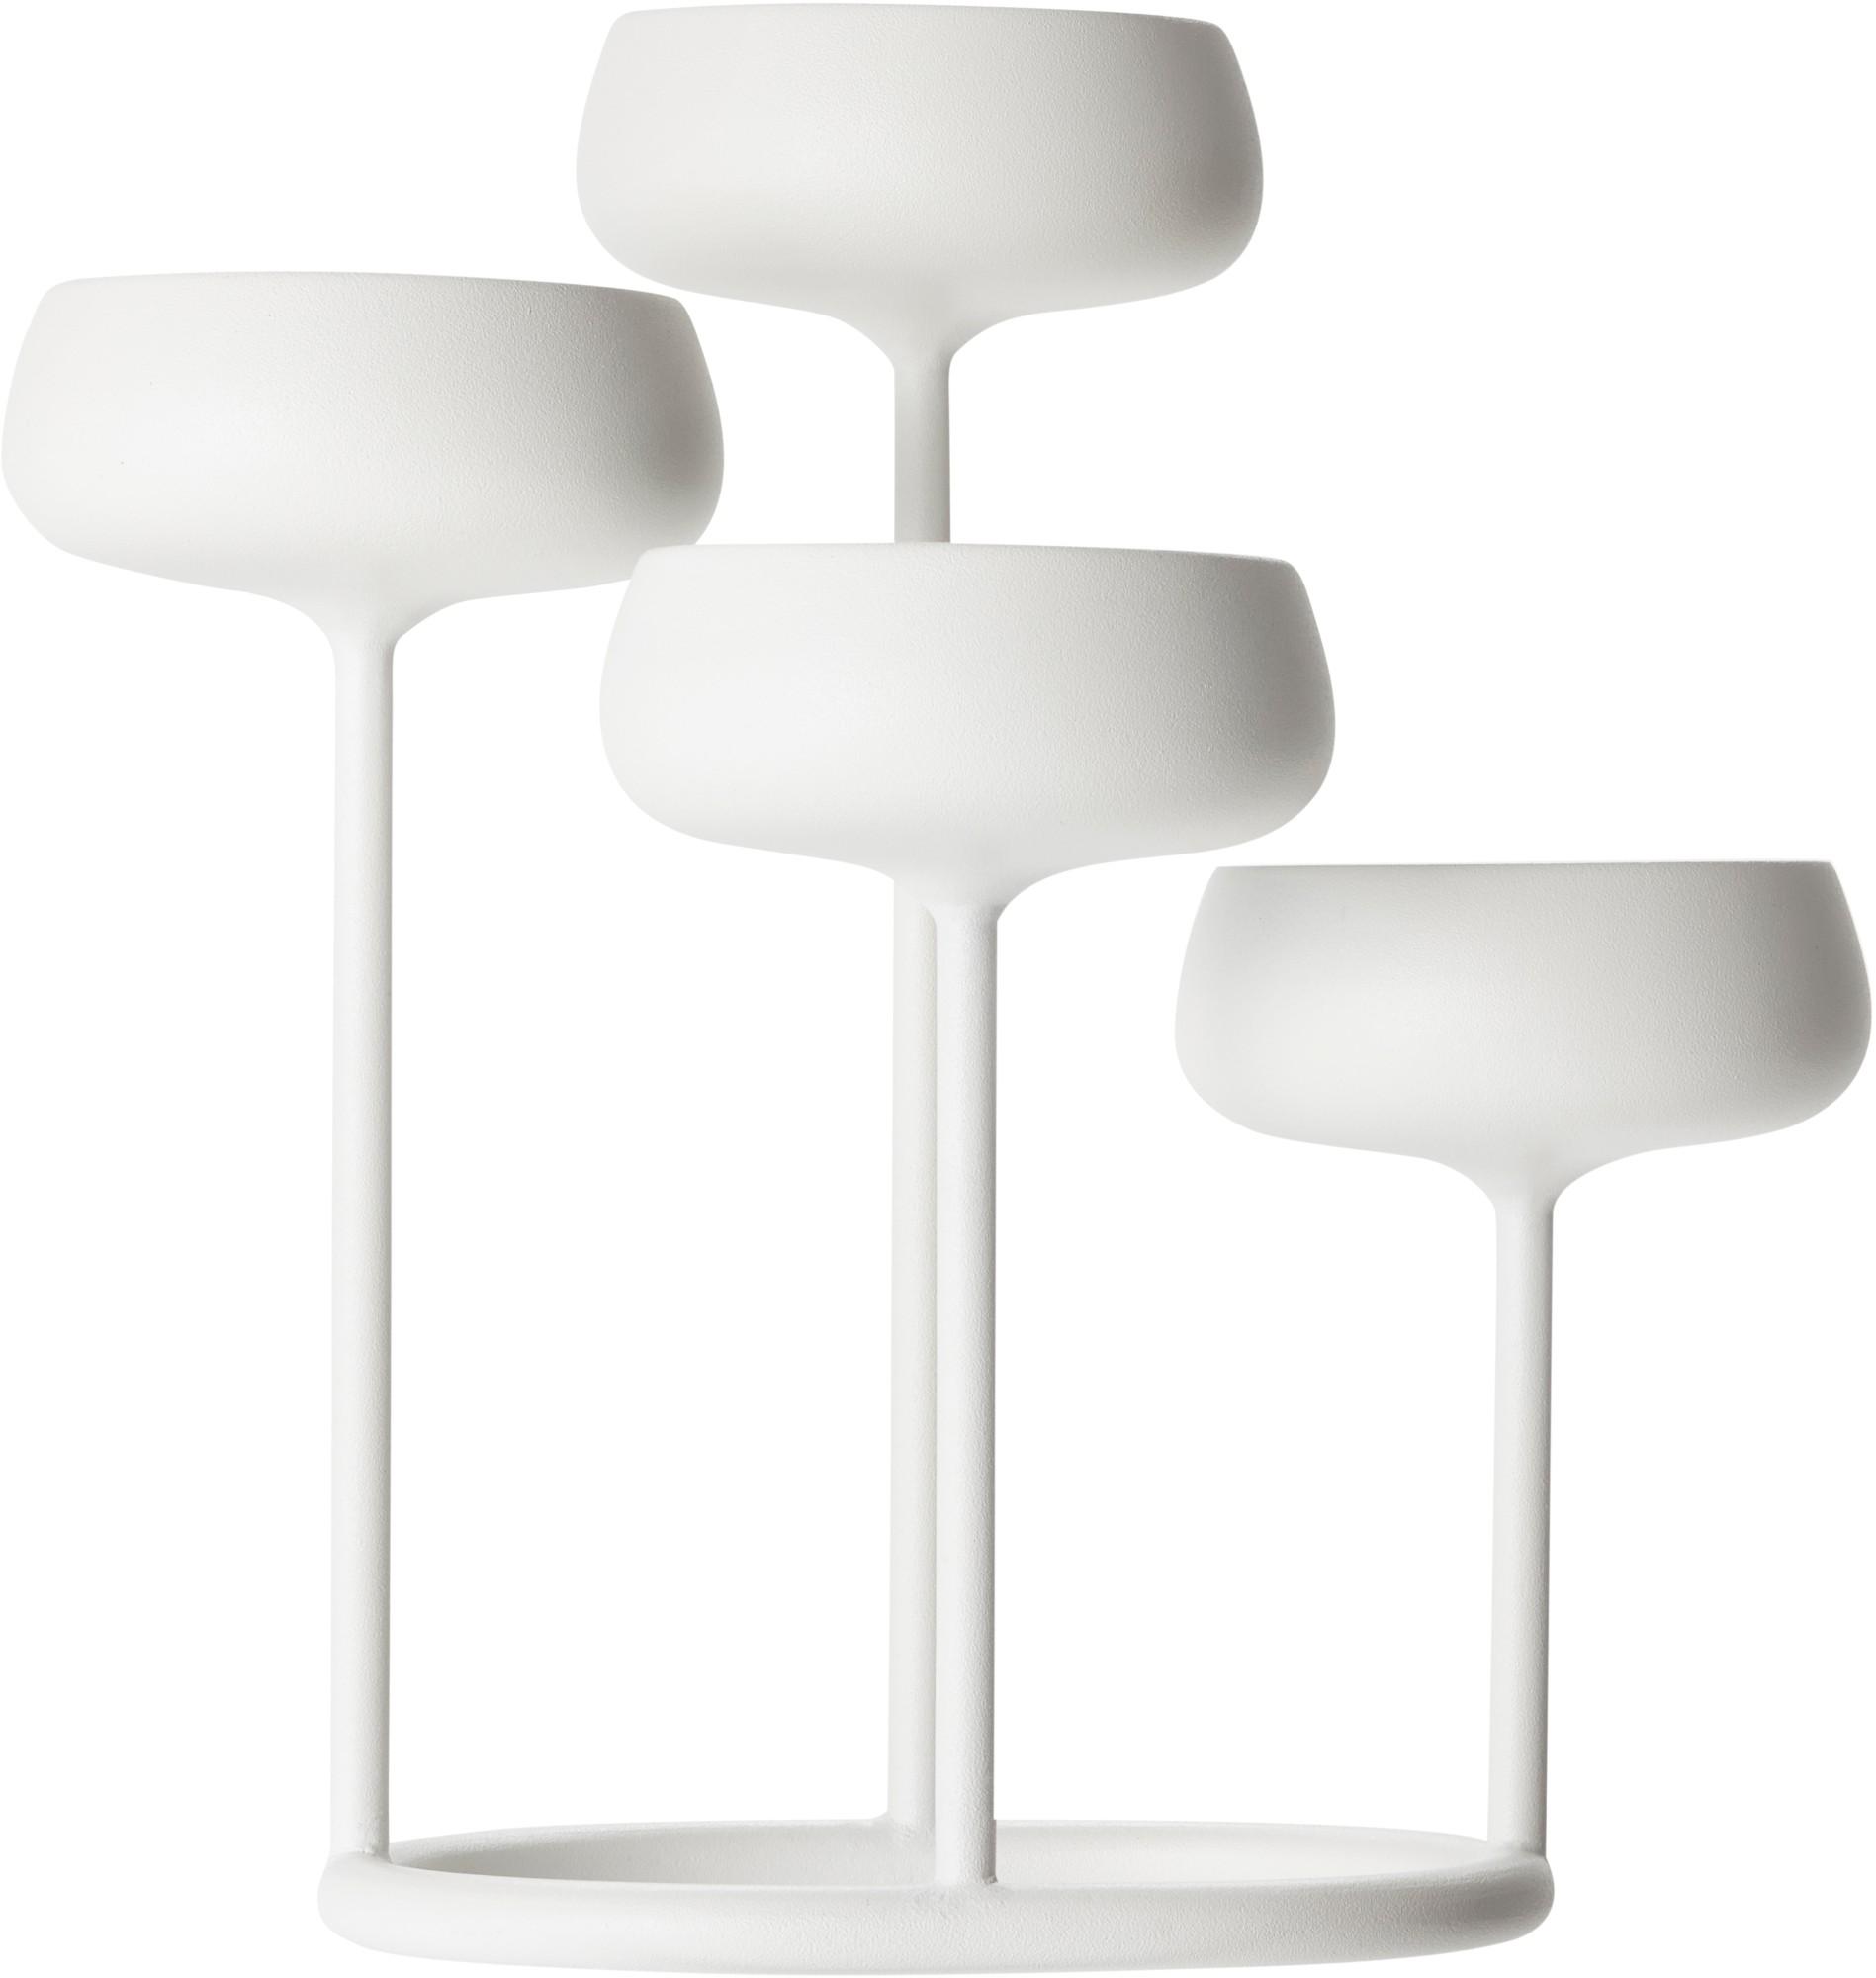 Iittala - Nappula candelabra 251 x 263 mm white - Iittala.com 5f494c3e2ac